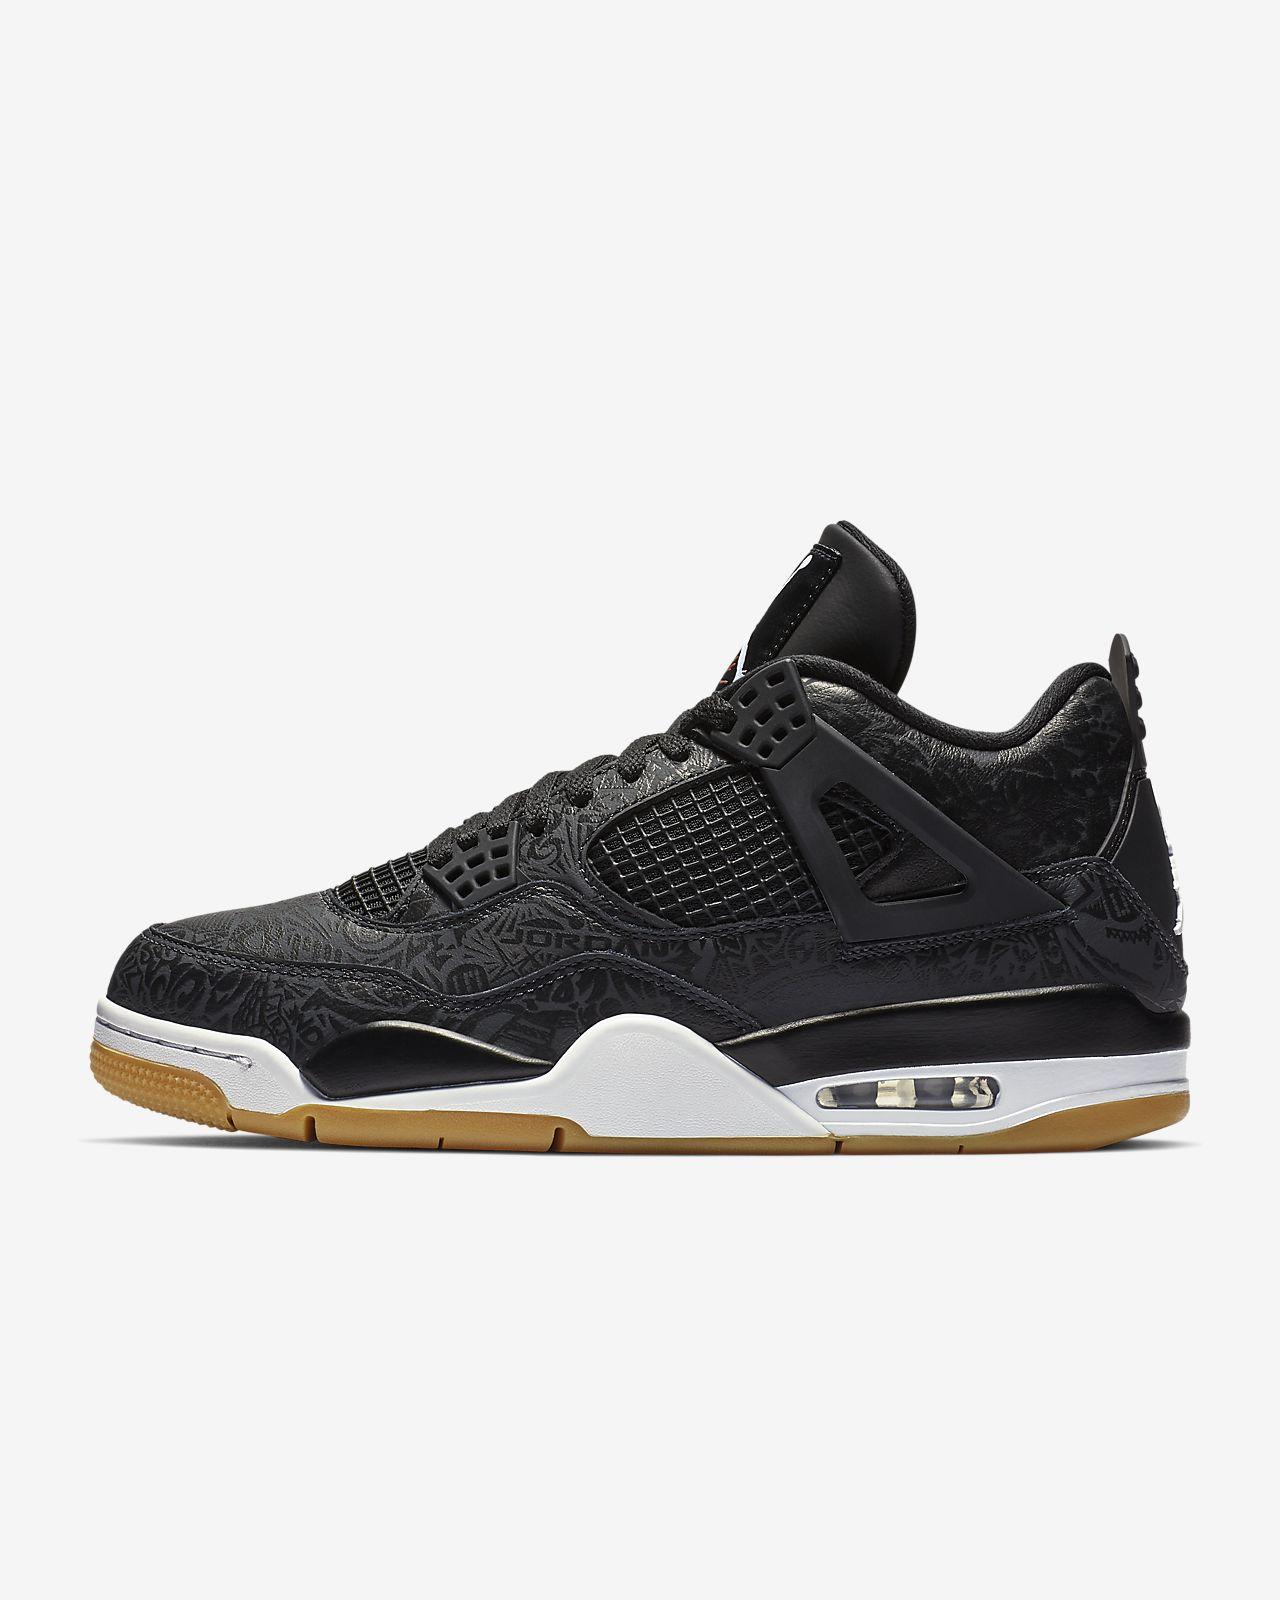 cde0a9d41f0 Air Jordan 4 Retro SE Men s Shoe. Nike.com GB